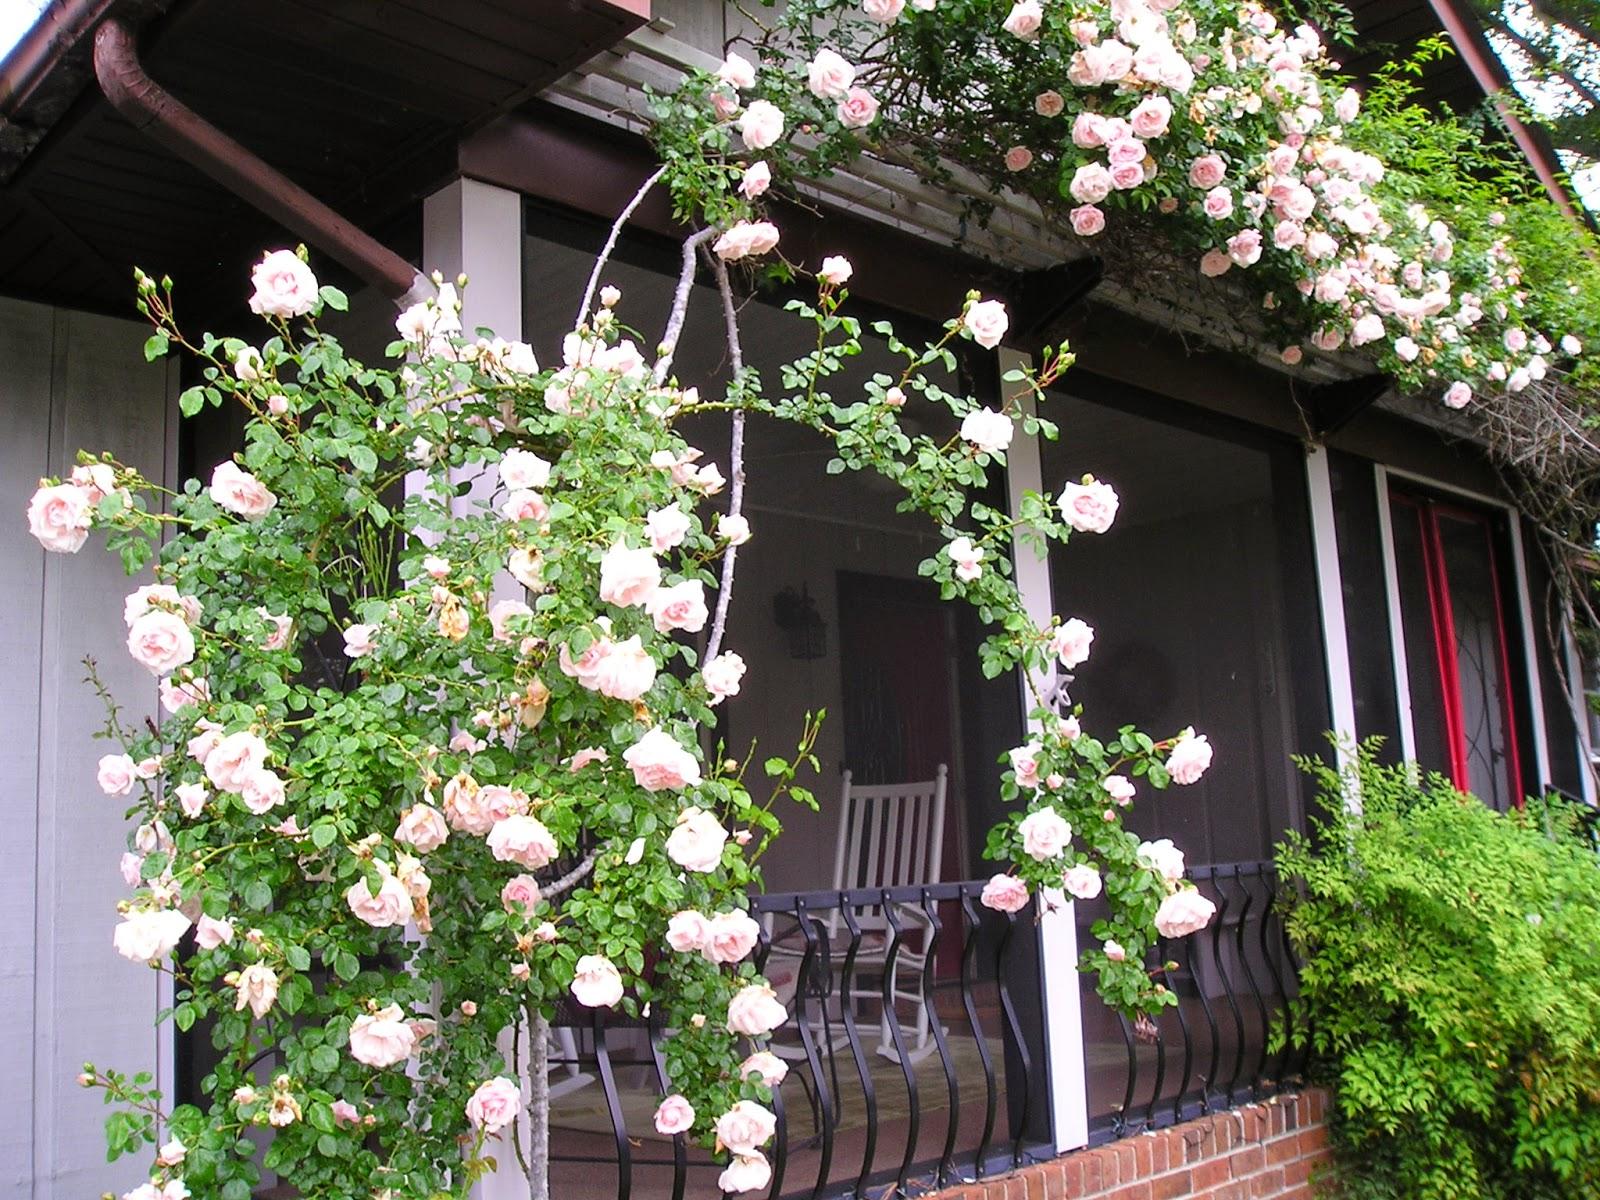 Carol S Greenville Nc Garden New Dawn Rose